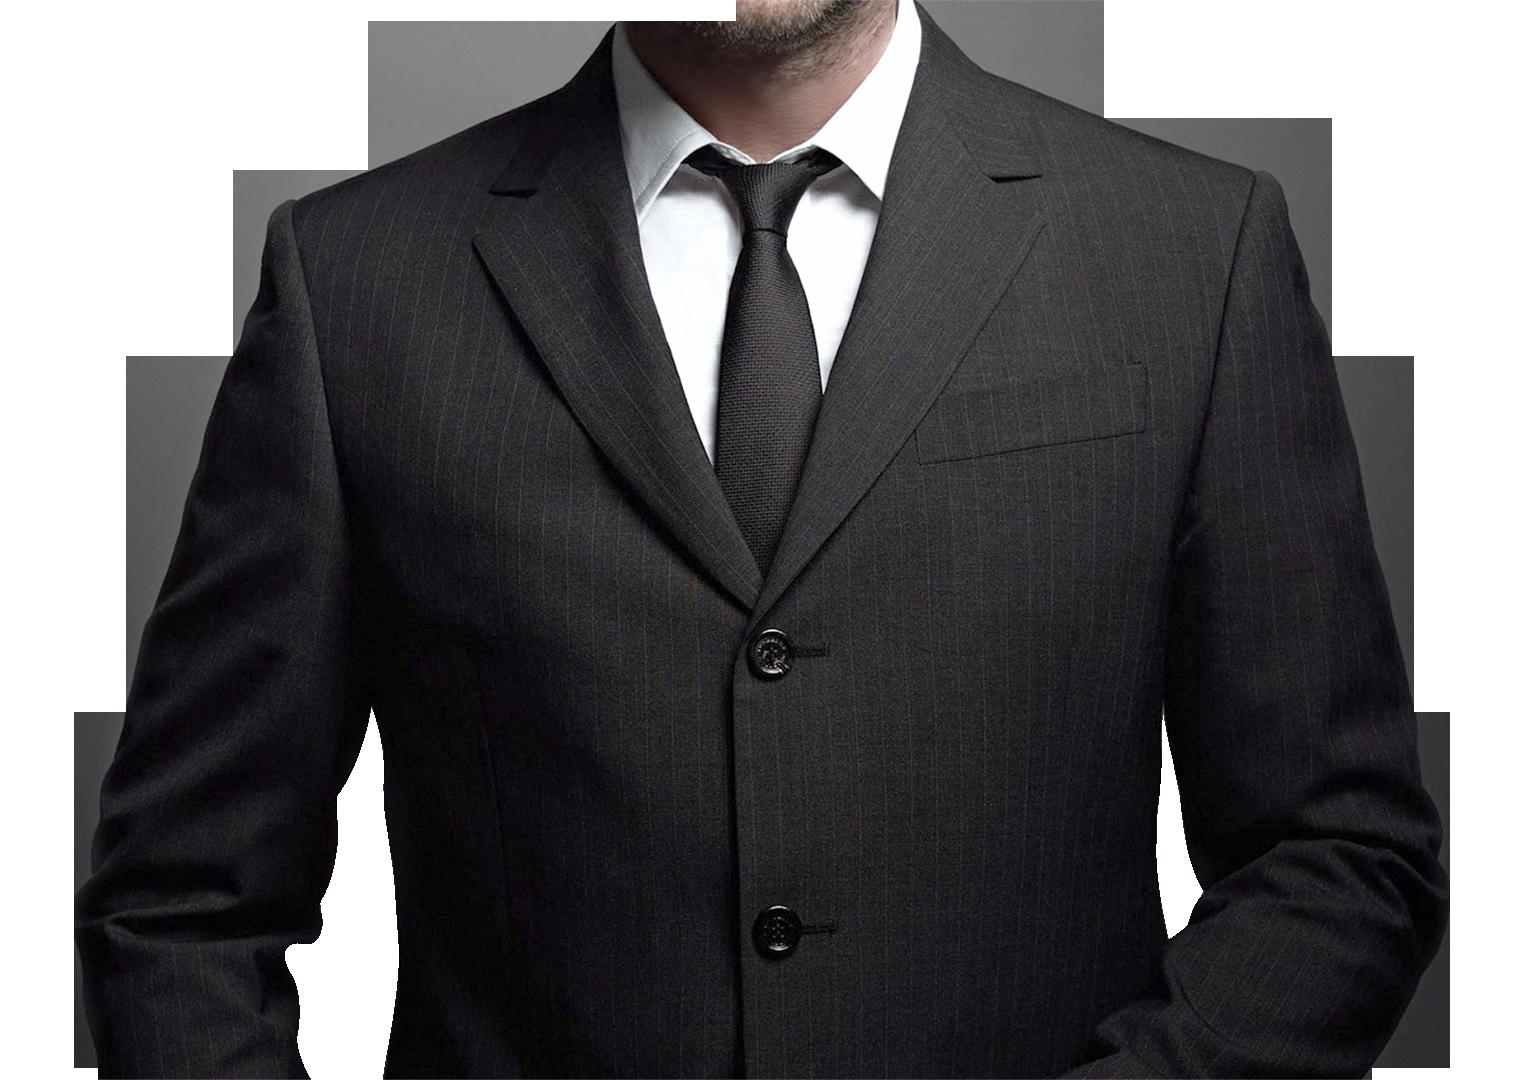 Suit Png Image All Black Suit Black And White Suit Formal Attire For Men